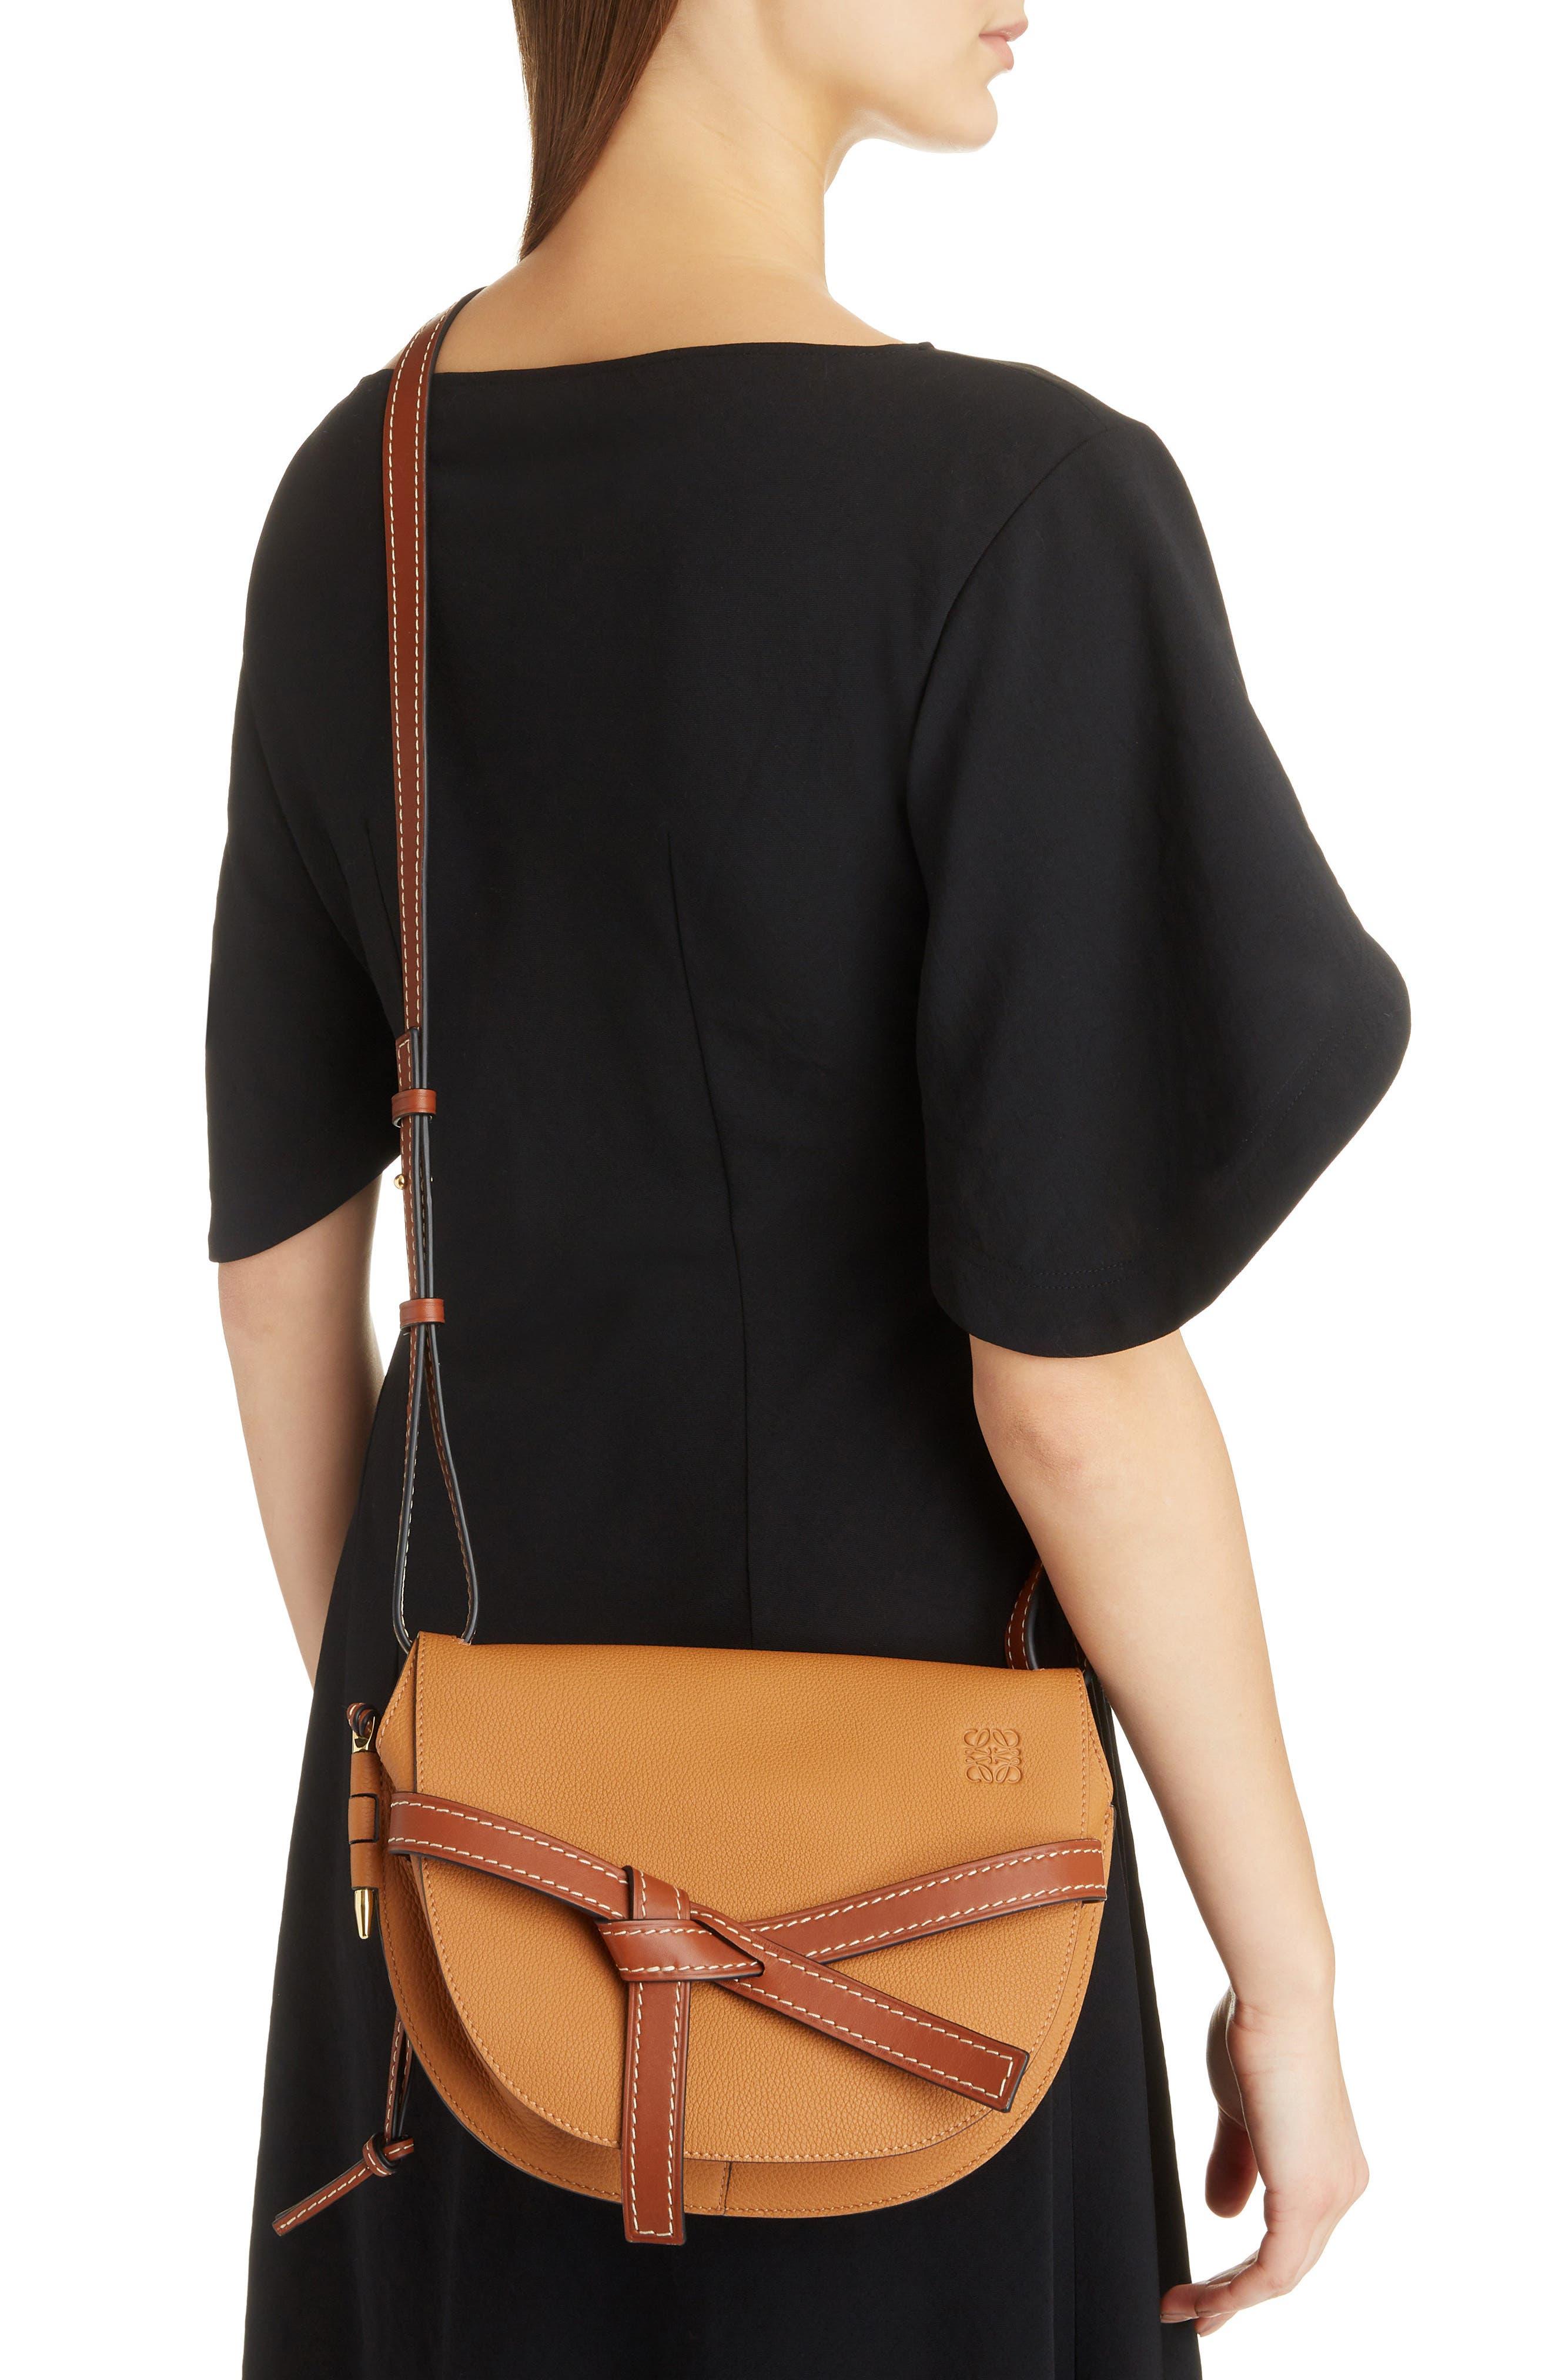 LOEWE,                             Small Gate Leather Crossbody Bag,                             Alternate thumbnail 2, color,                             LIGHT CARAMEL/ PECAN